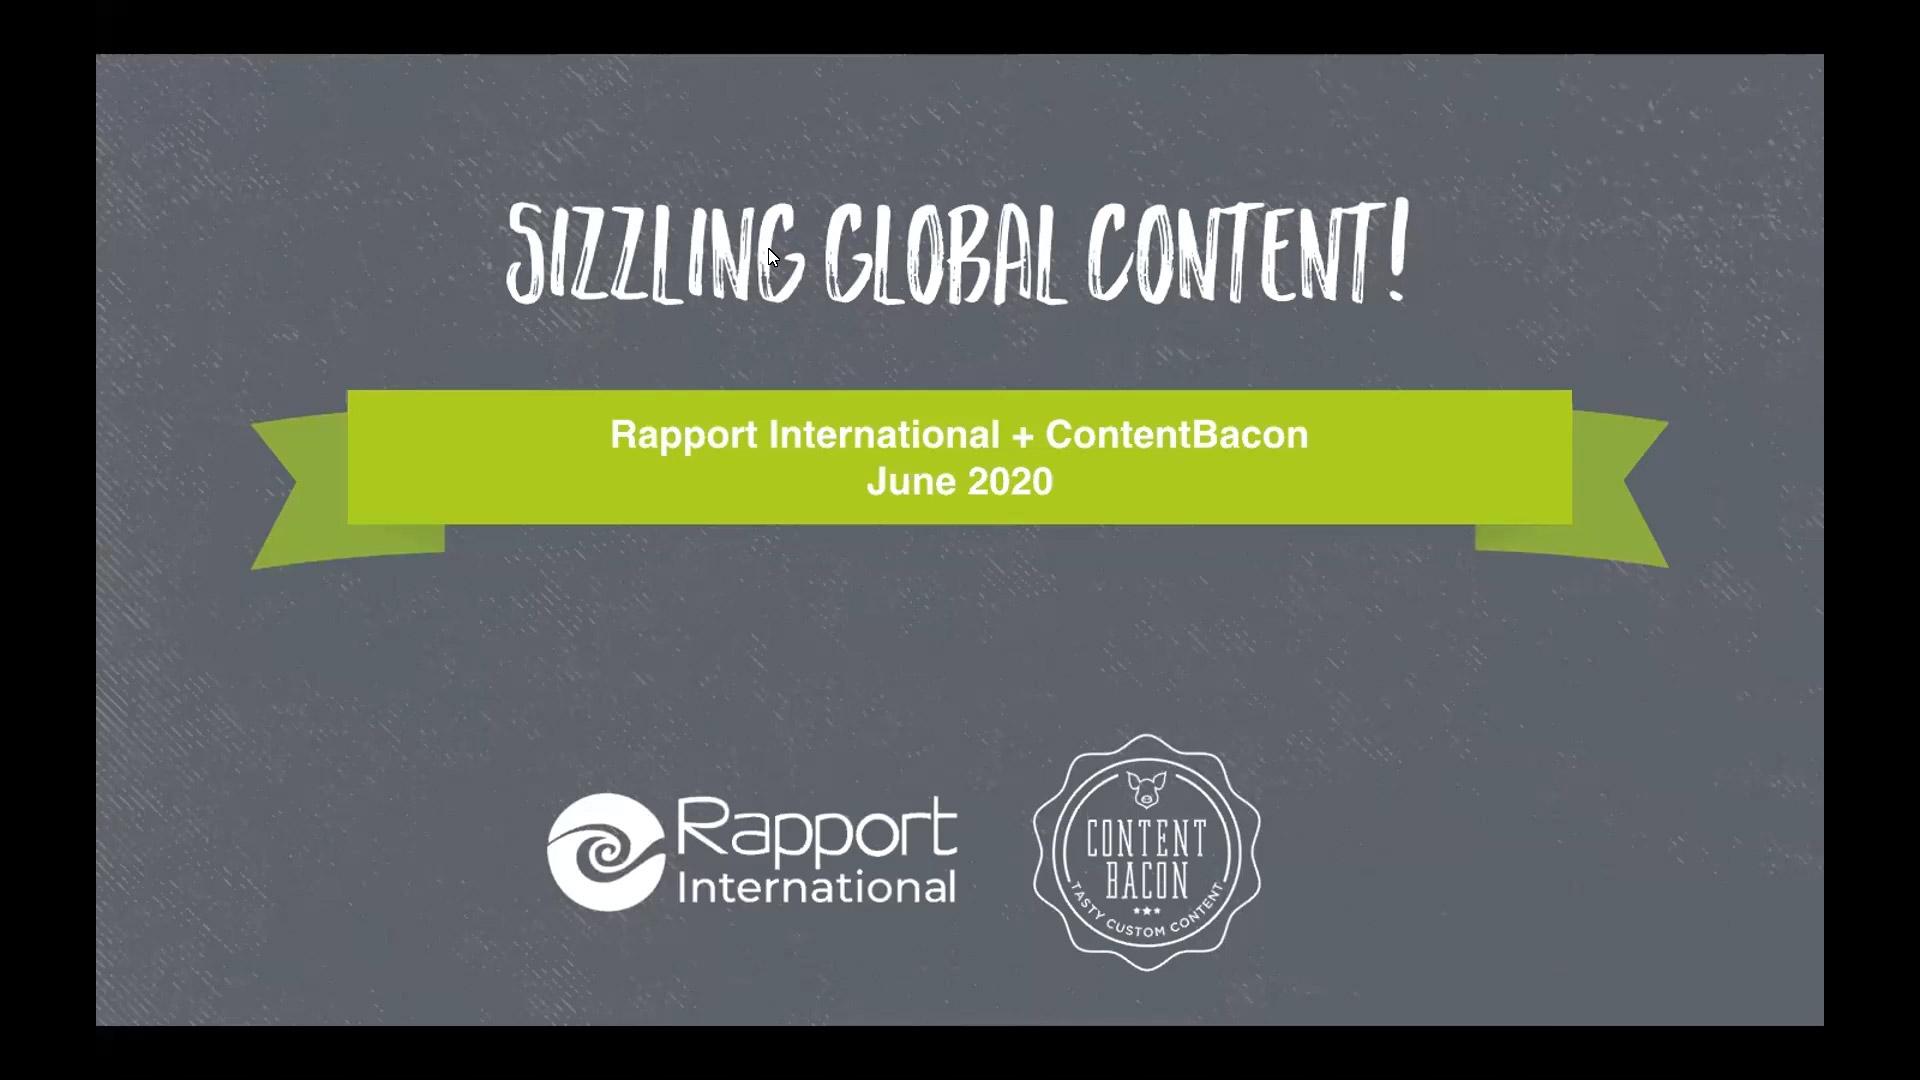 Sizzling Global Content Webinar 6-24-2020